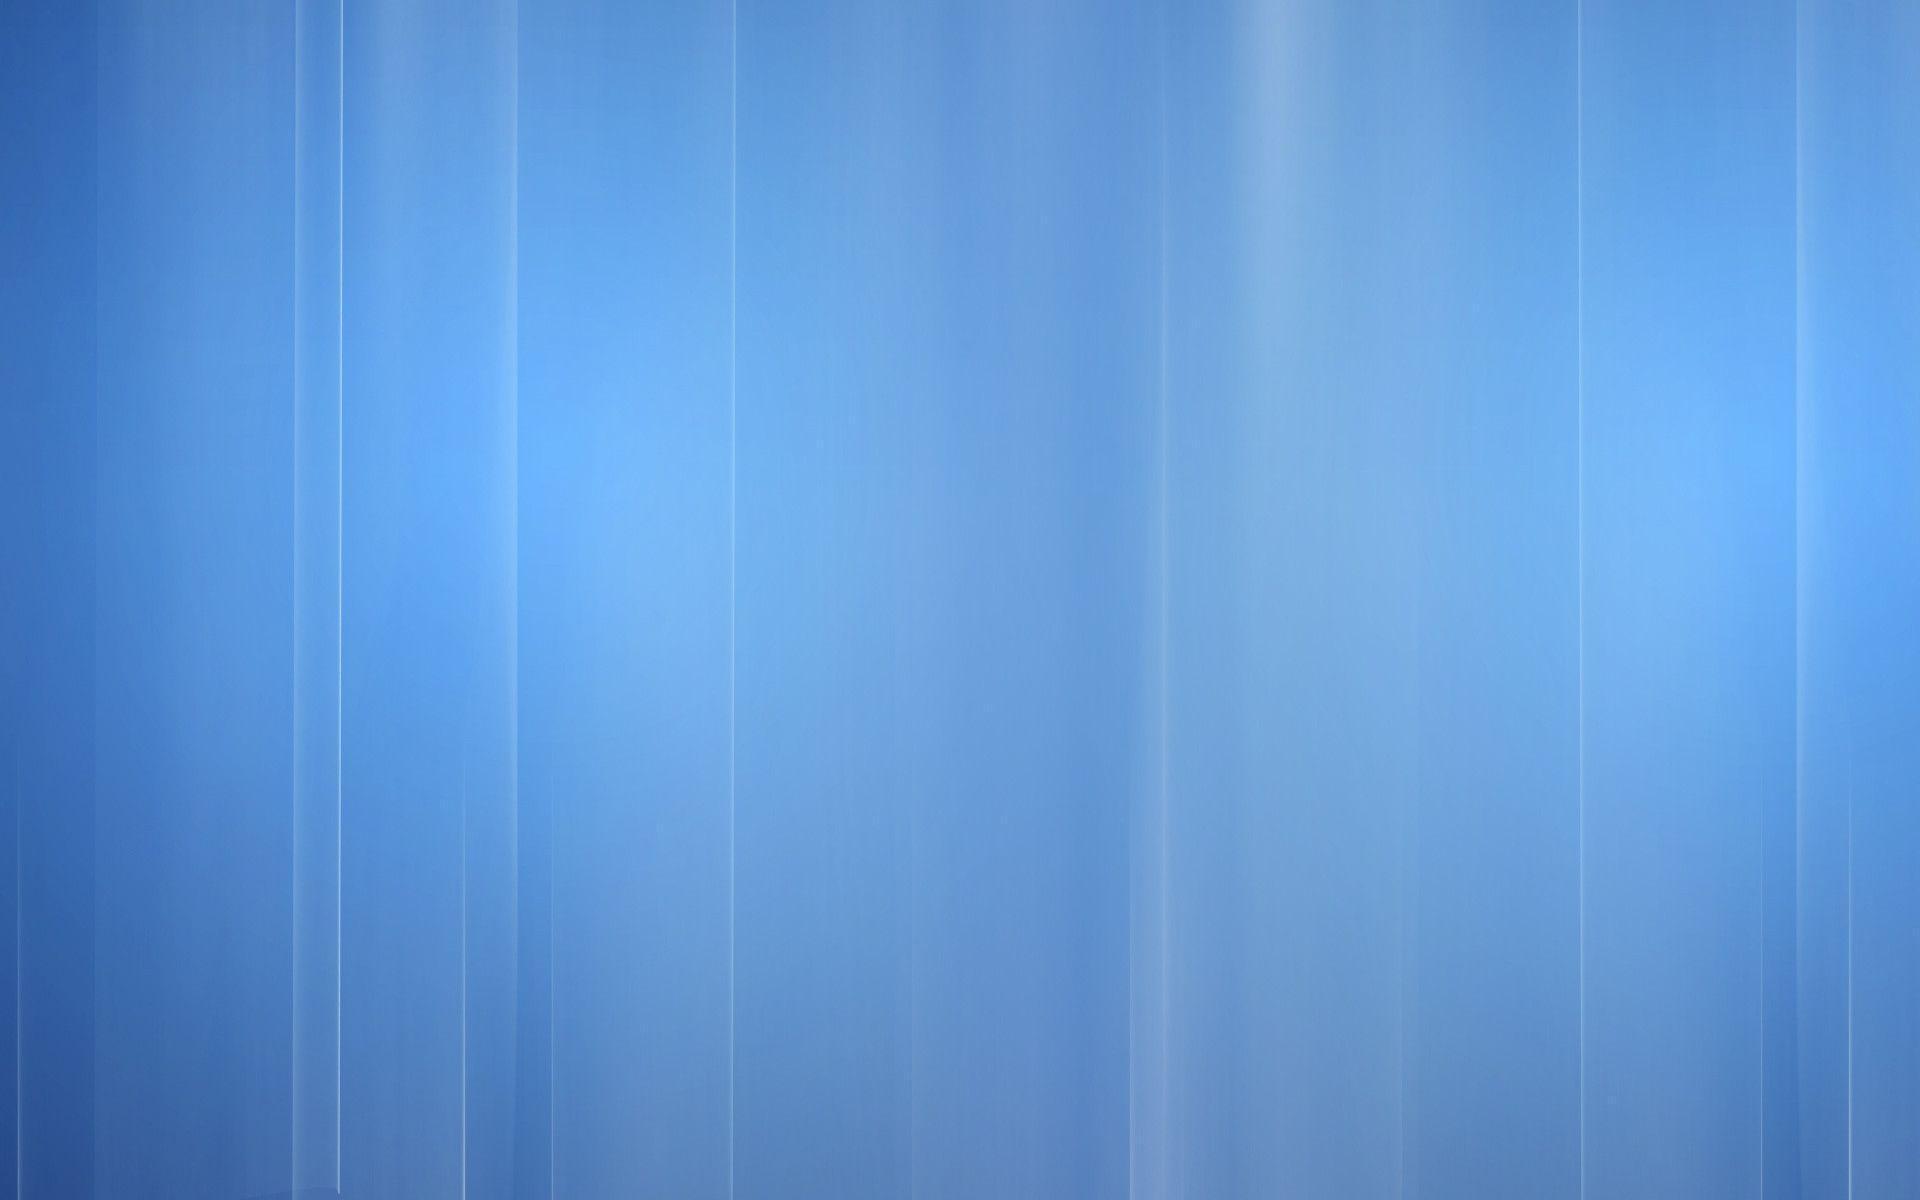 floral hd HD Blue Wallpaper